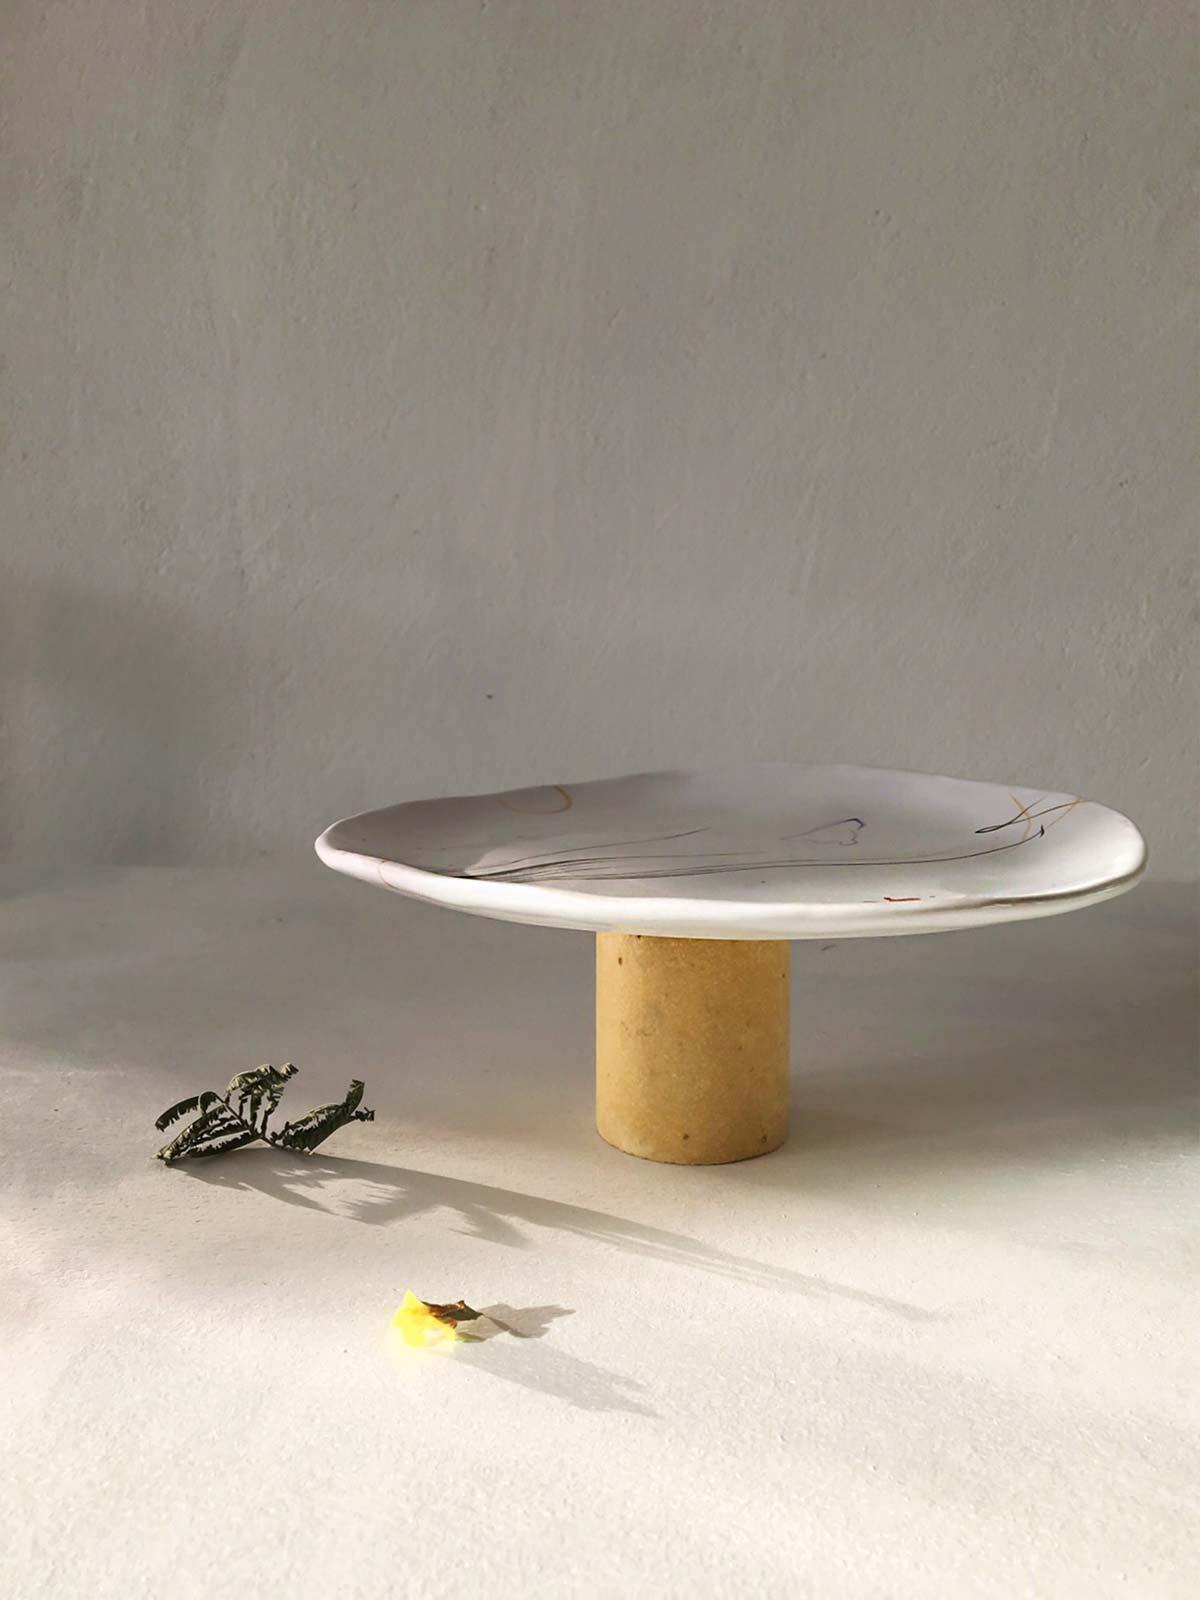 Side view - Plate handmade